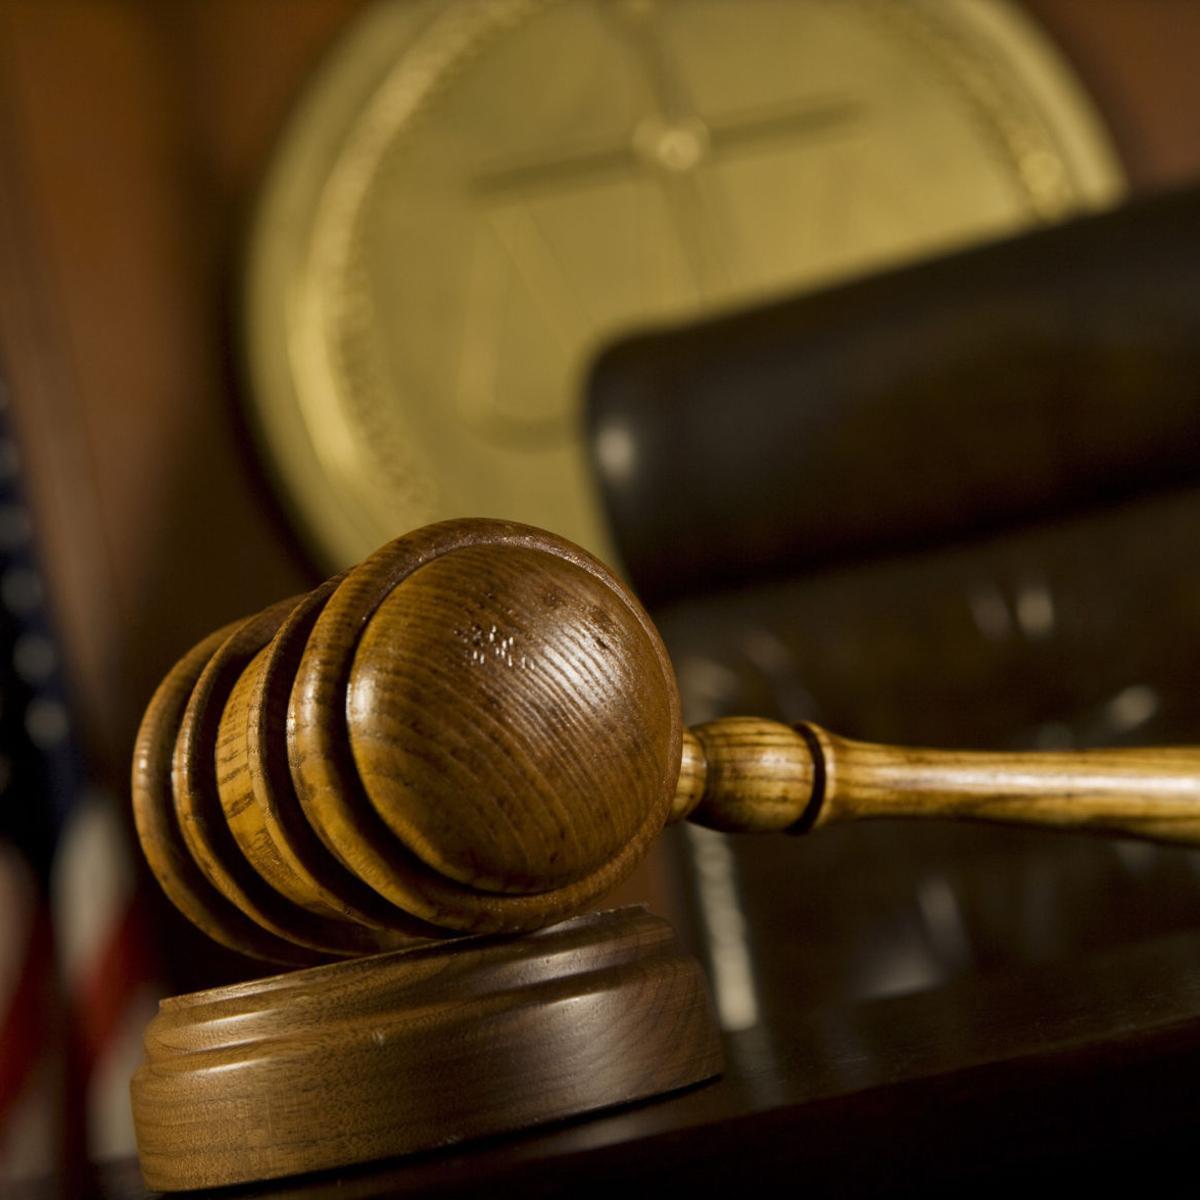 Martinsville-based doctor found guilty of 861 drug charges | Crime